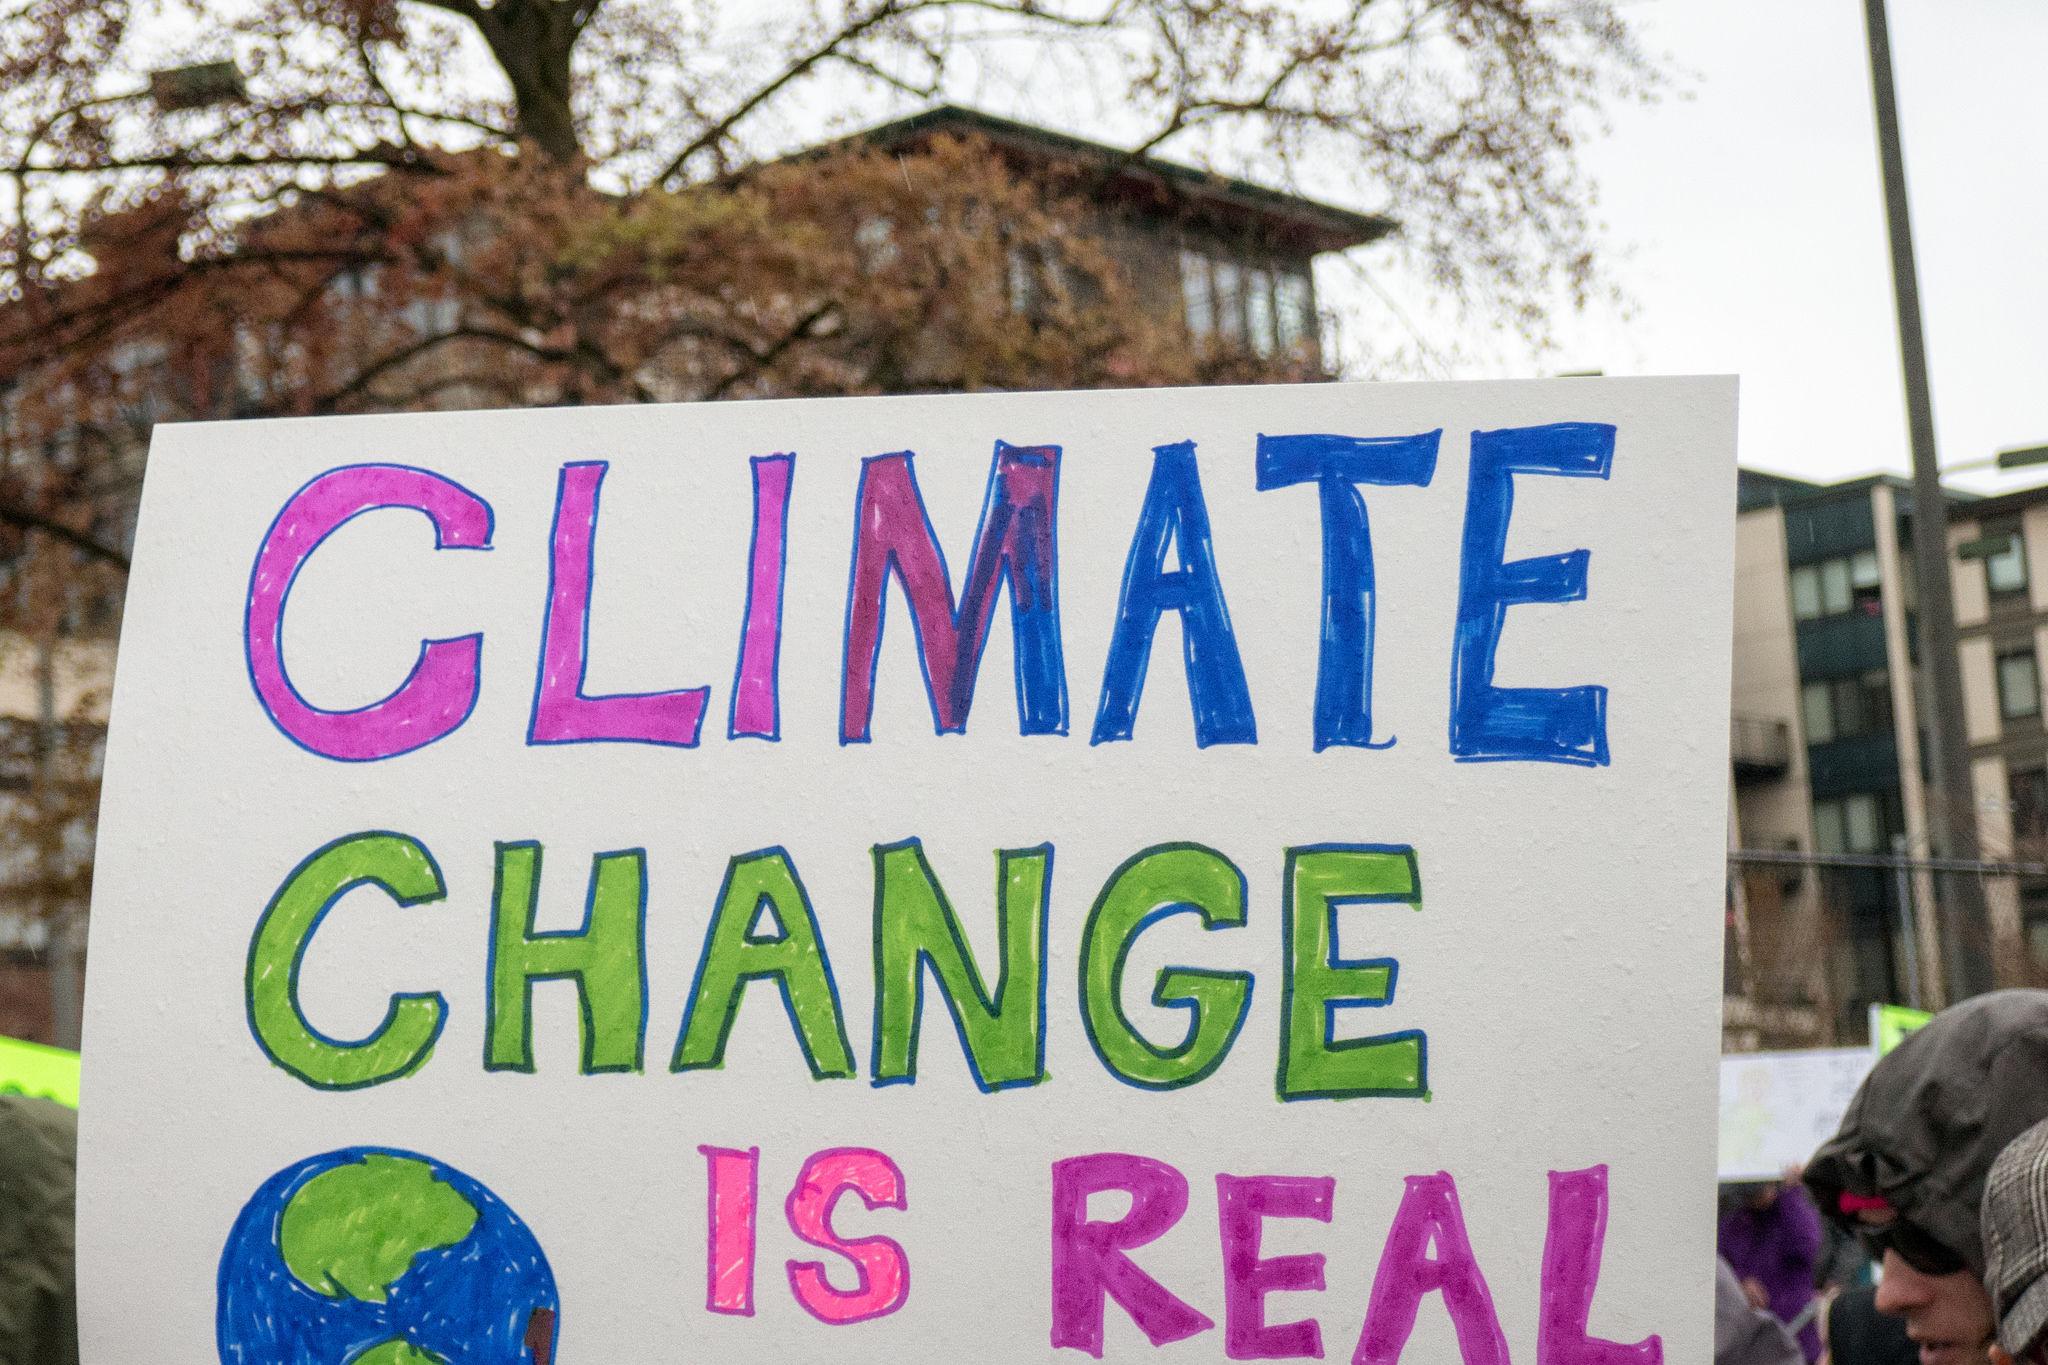 Climate change david lee march for science seattle u6viaz